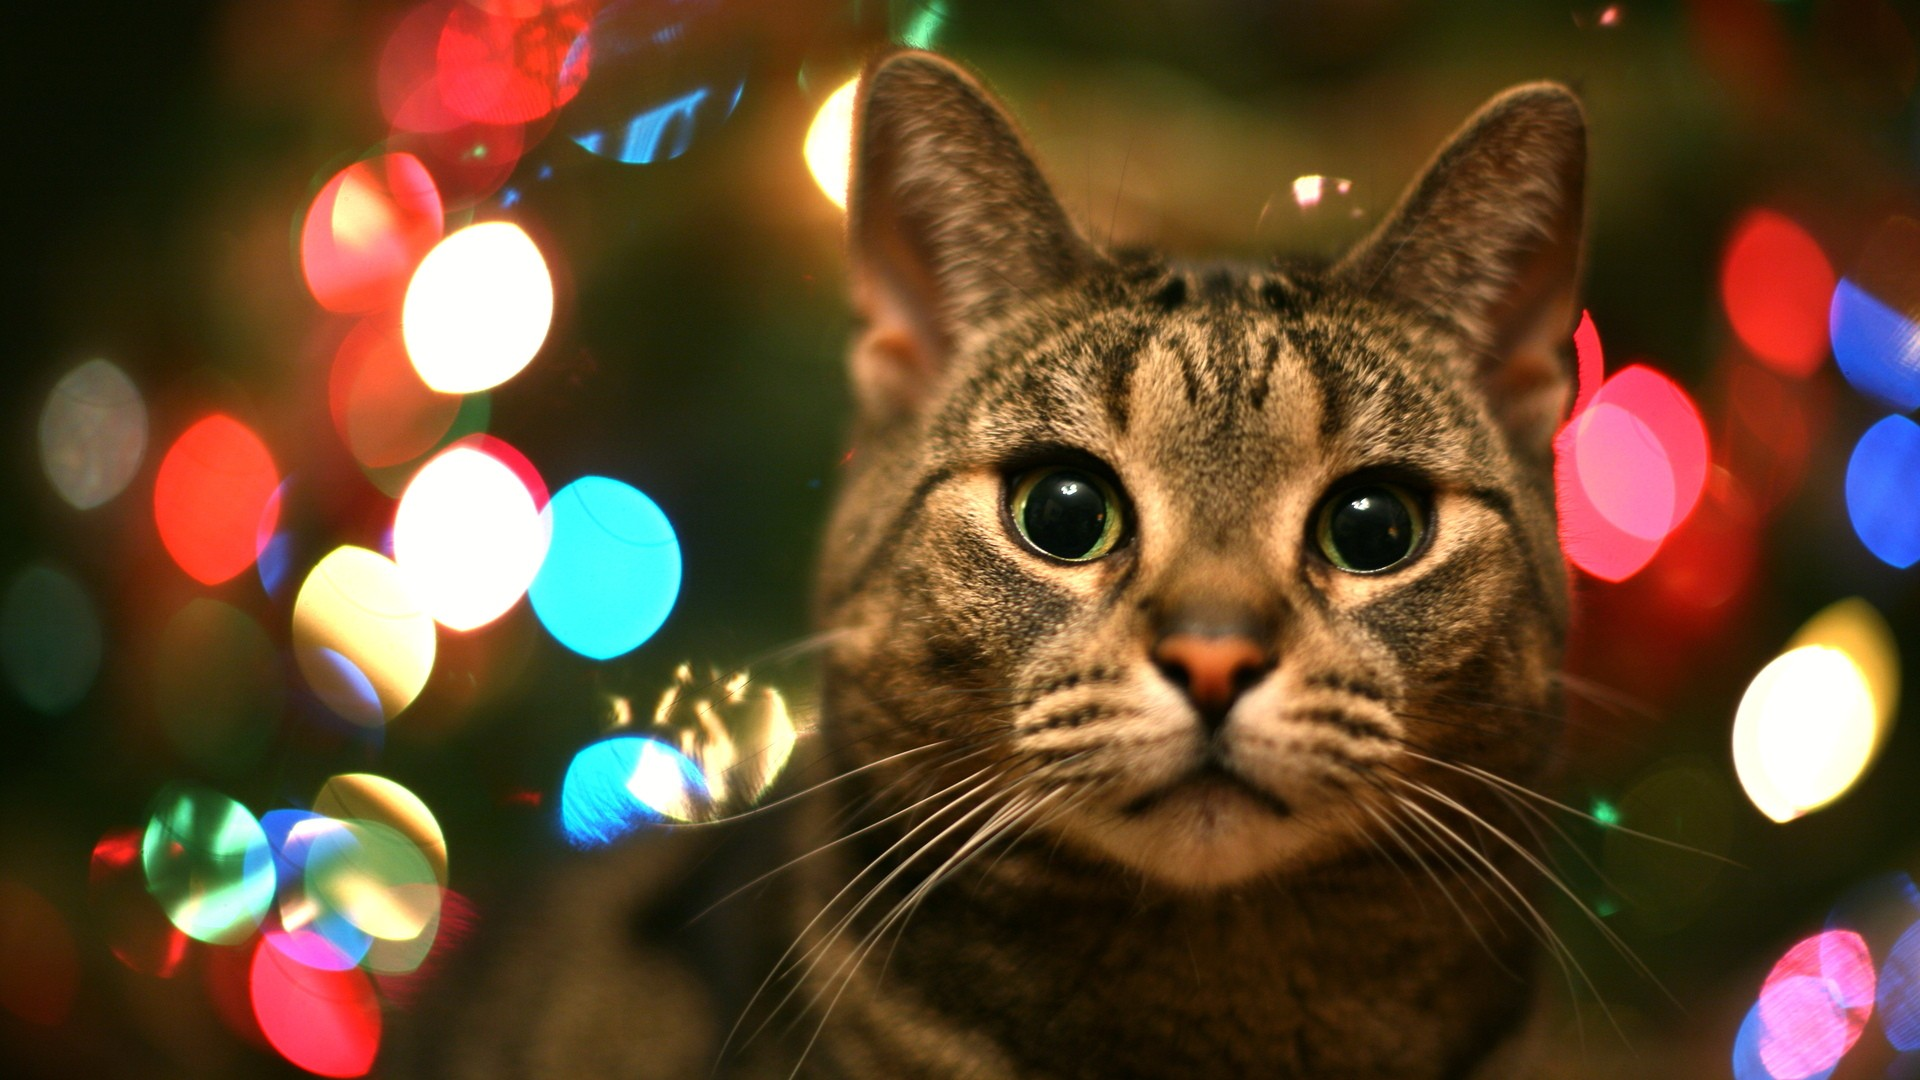 Animal Cute Cat Macro Wallpaper Desktop Wallpaper with 1920x1080 1920x1080